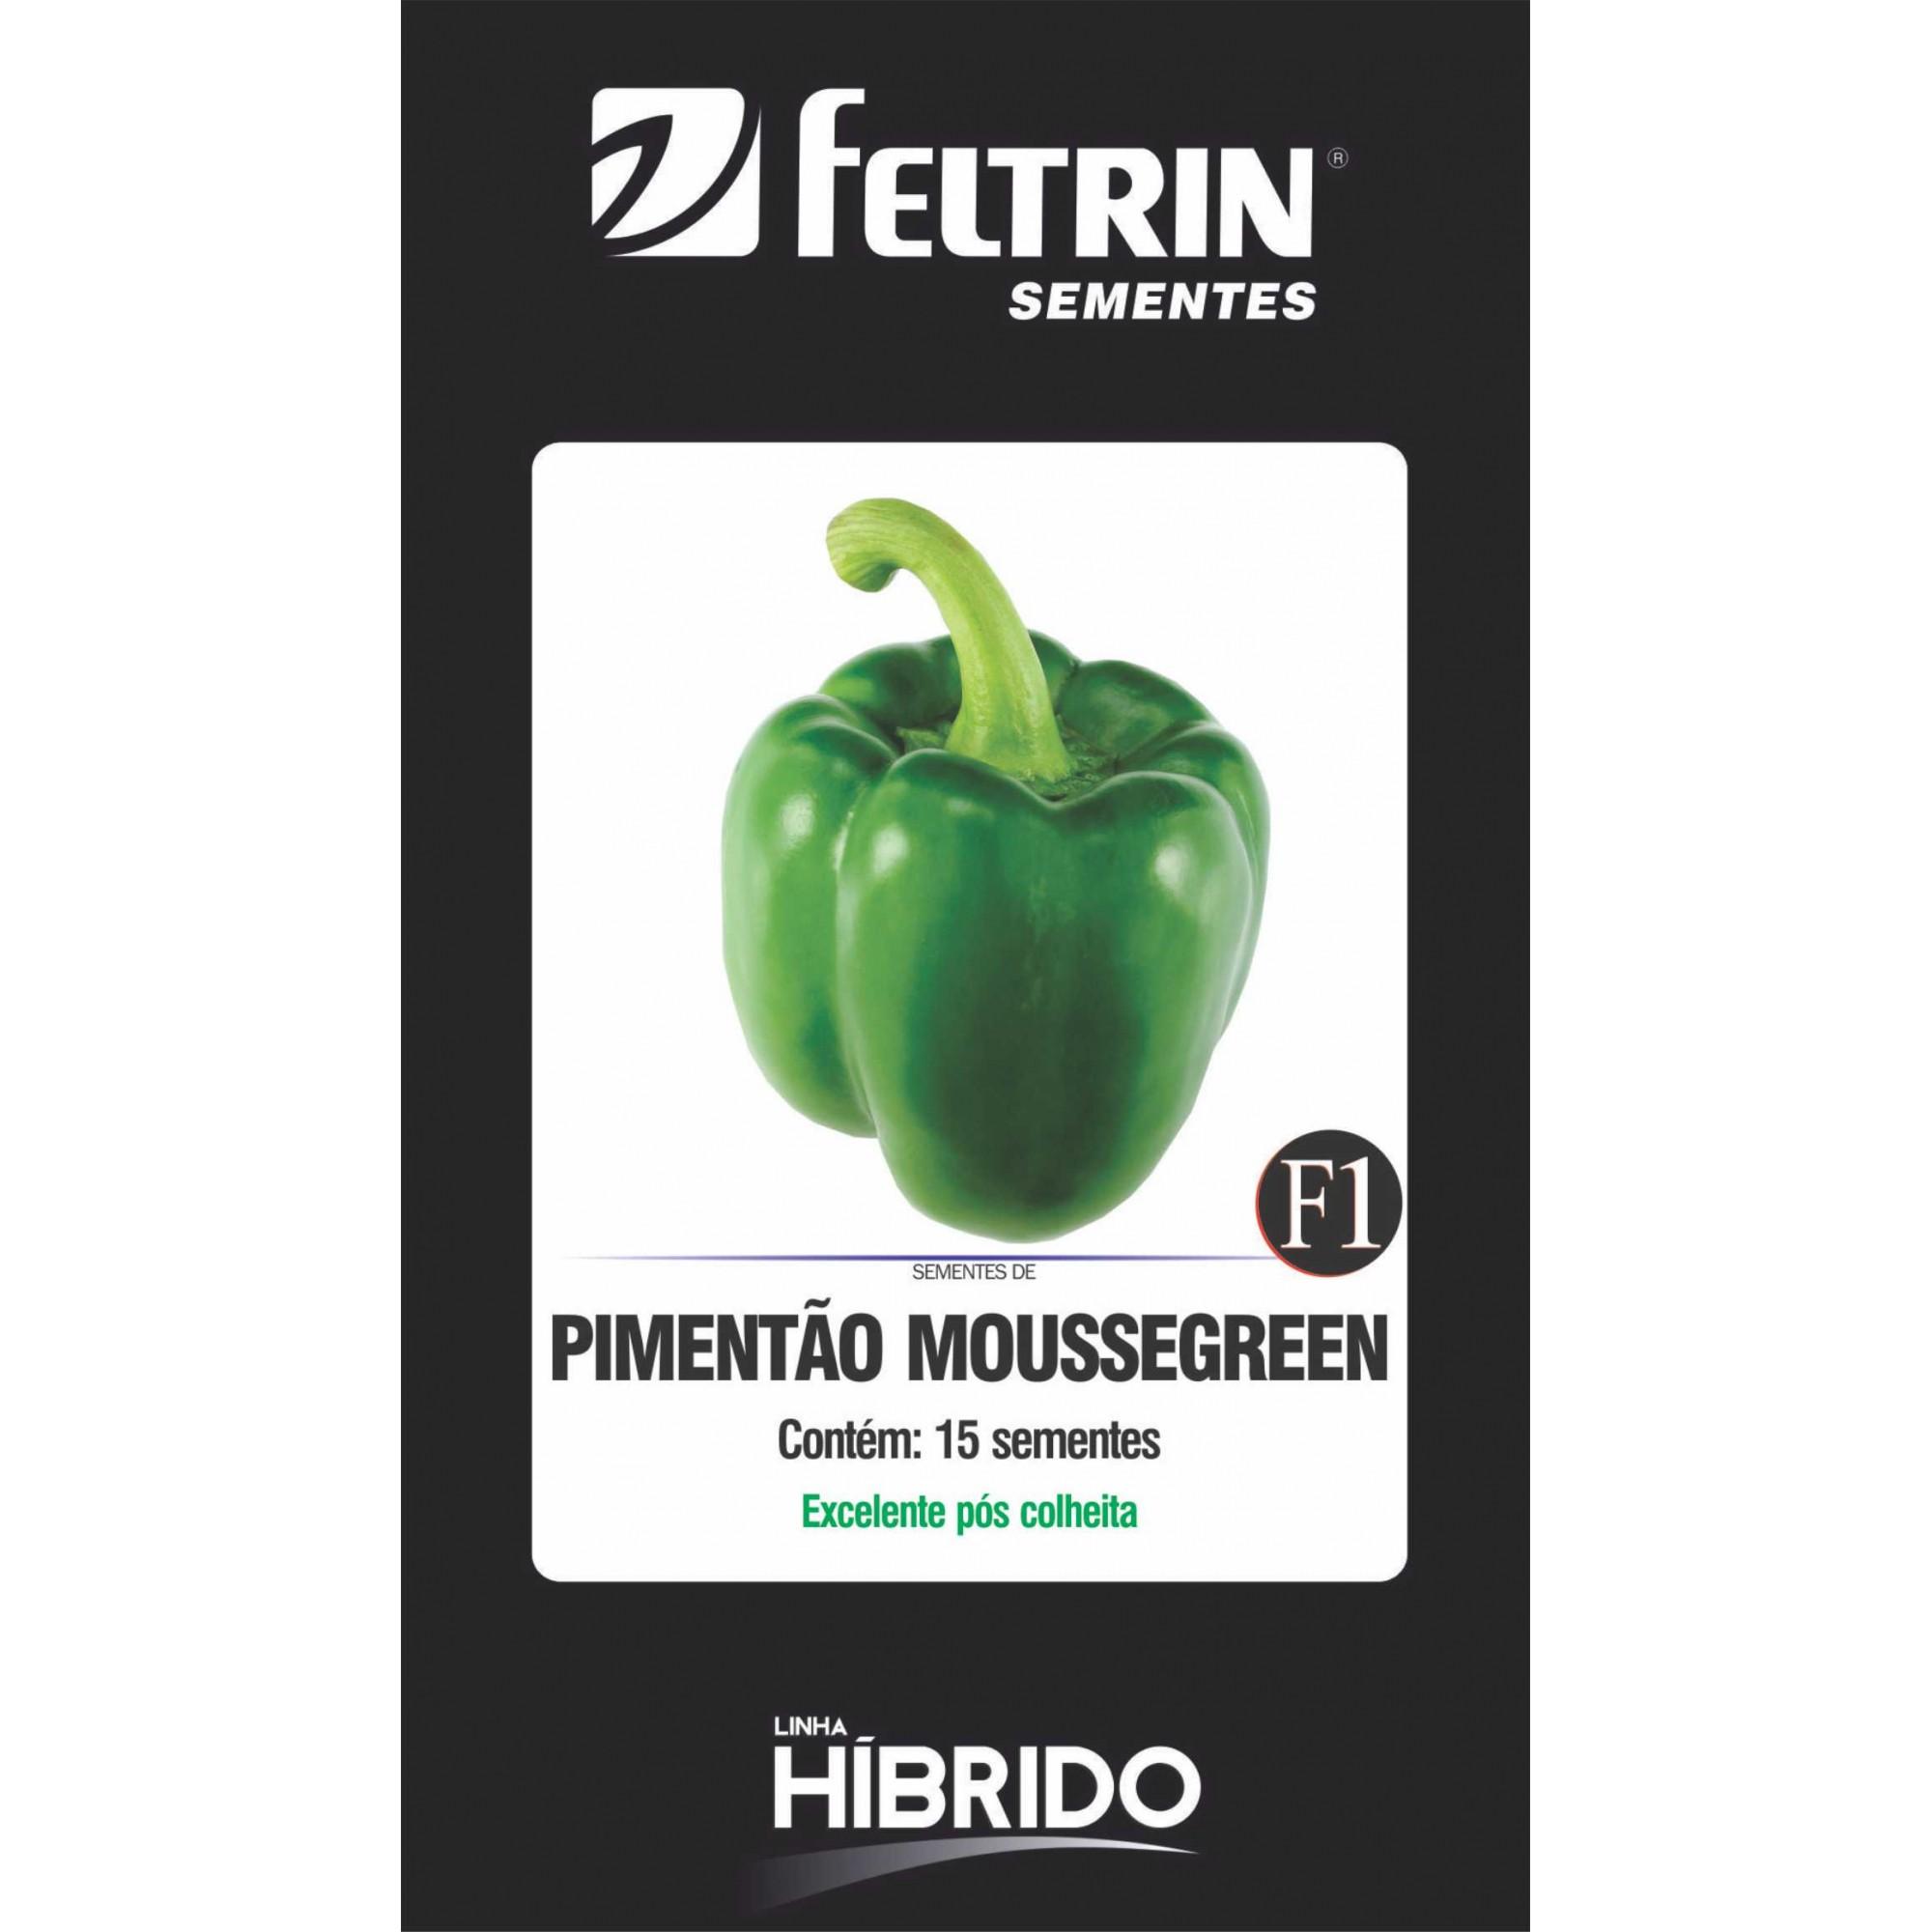 Pimentão Moussegreen - contém 15 sementes